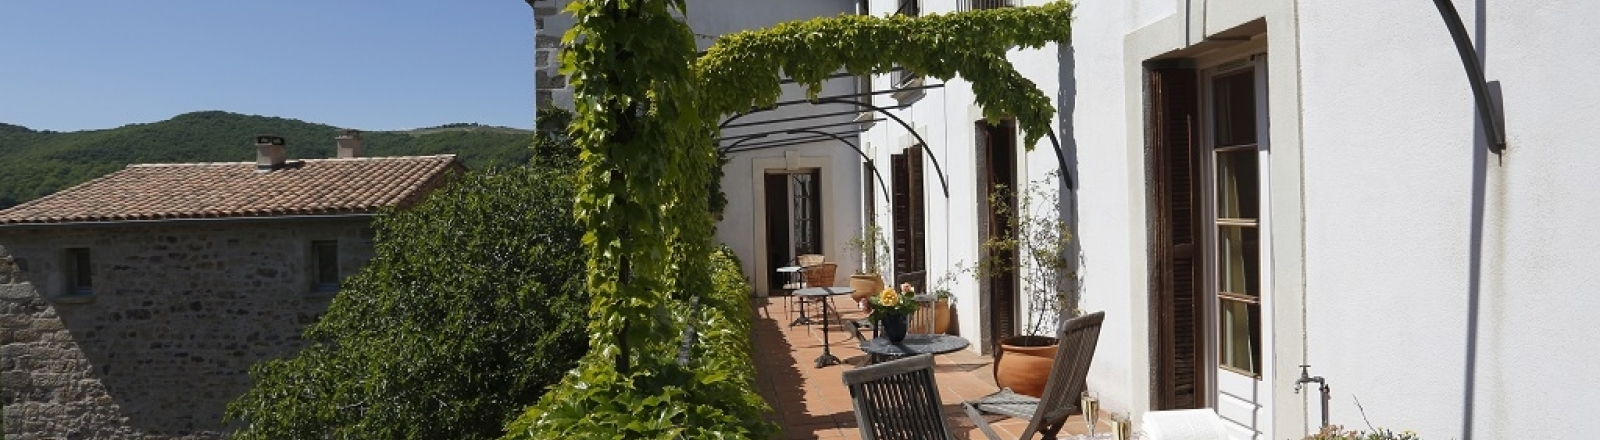 HOTEL RESTAURANT LA PALOMBE © La Palombe